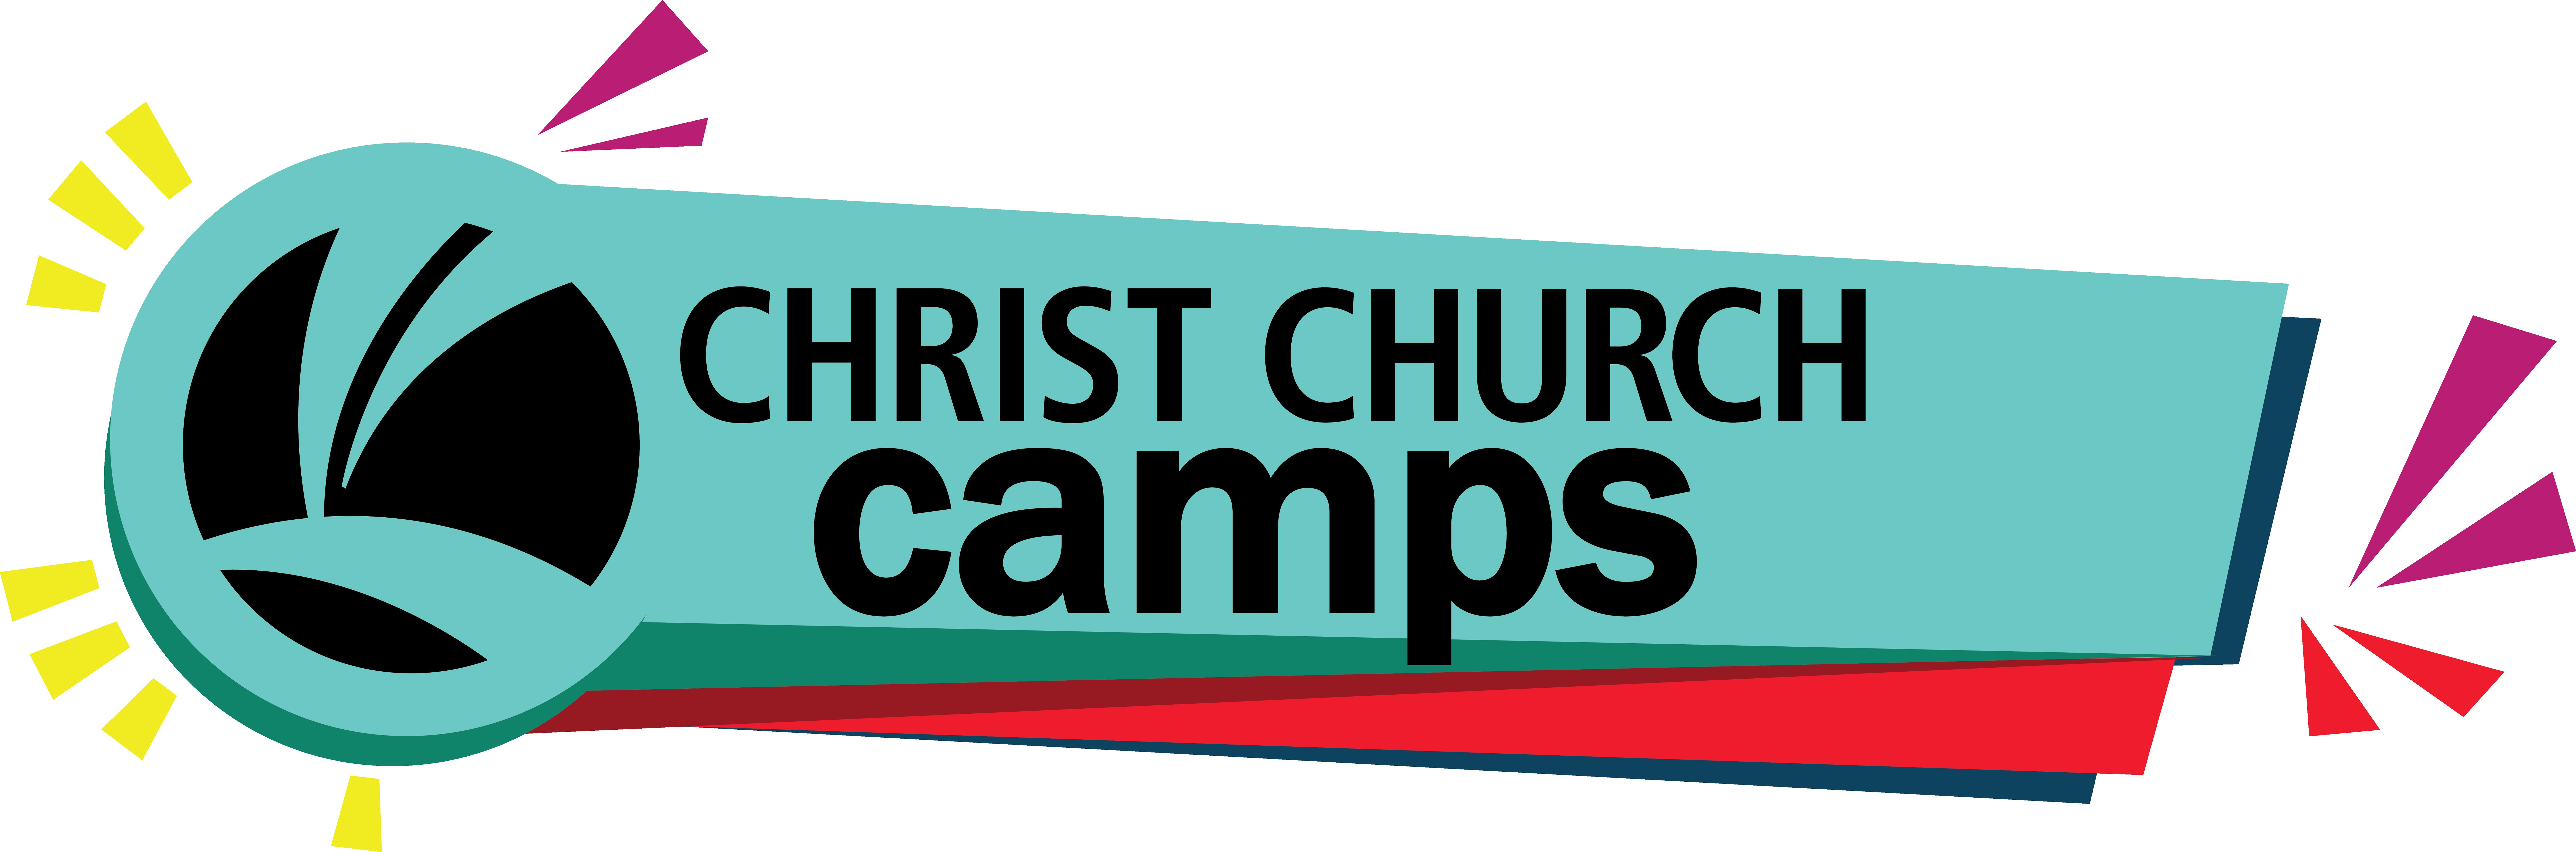 Christ Church Camps